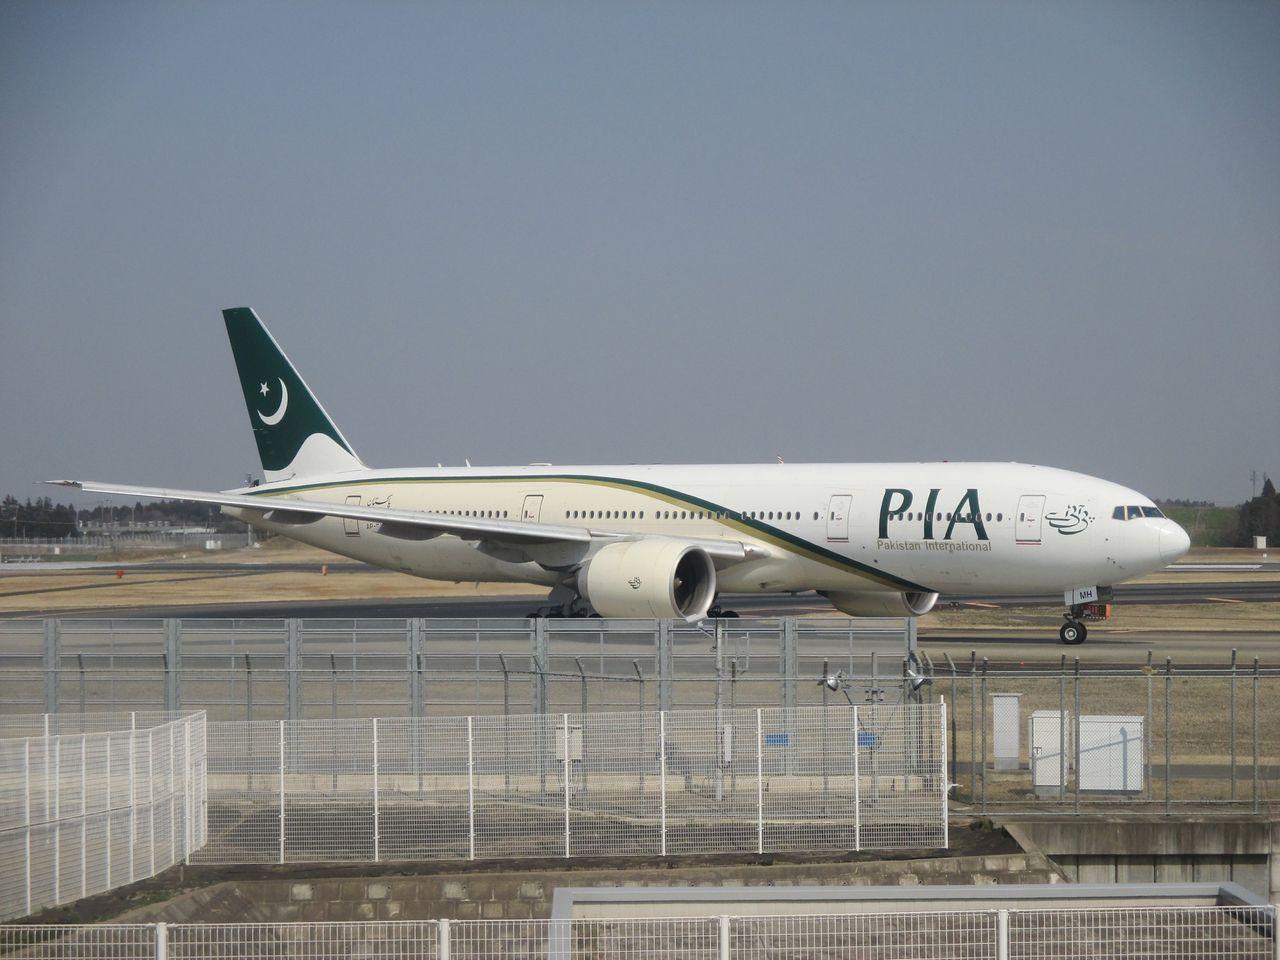 Var tredje pilot i Pakistan saknar licens